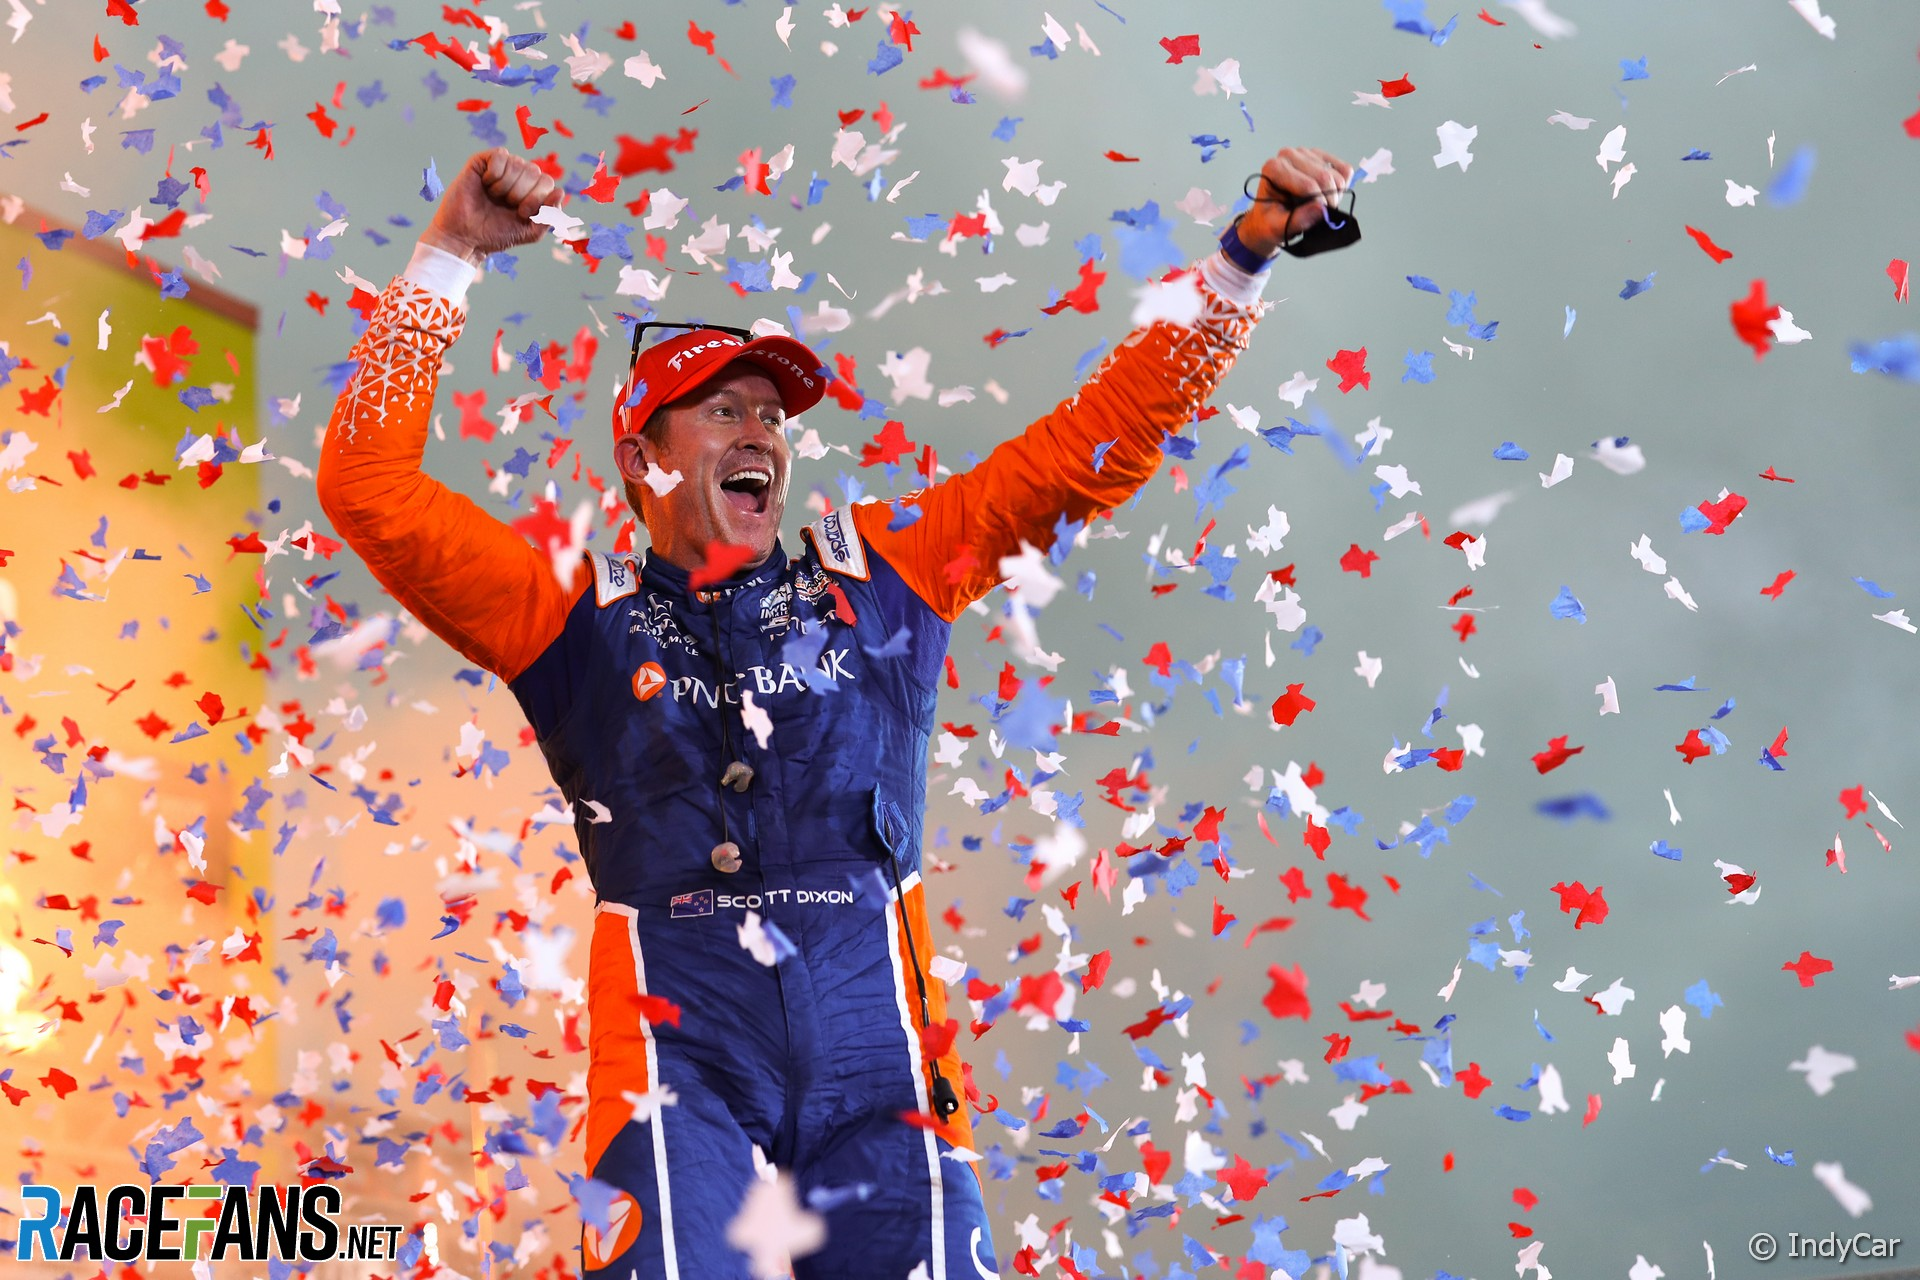 Scott Dixon, Ganassi, Texas, IndyCar, 2021